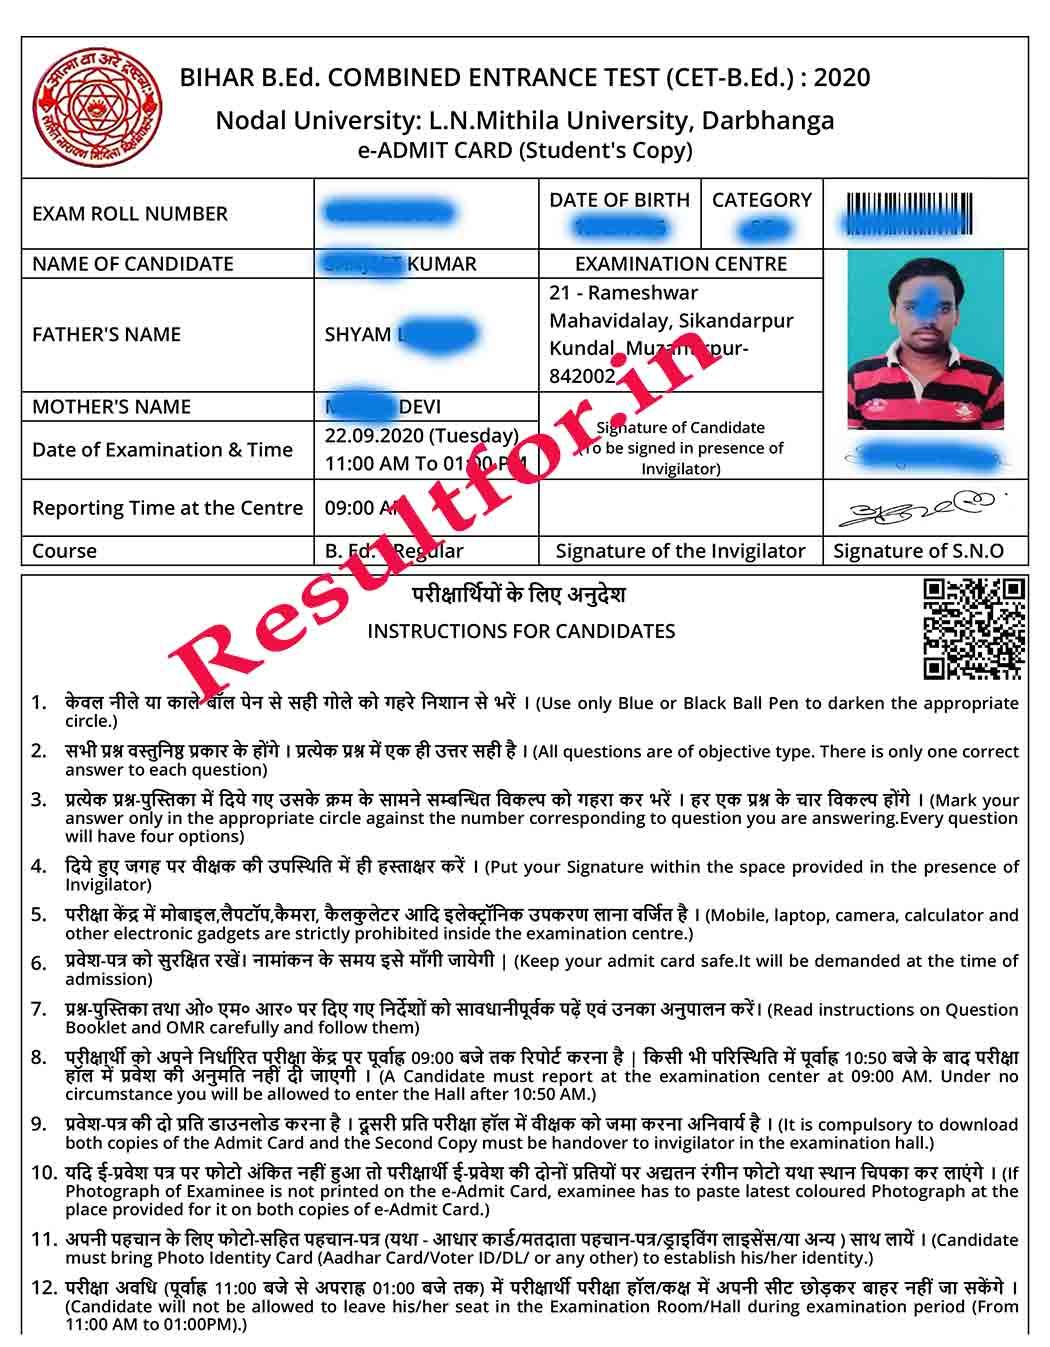 bihar bed cet common entrance test admit card 2020 view